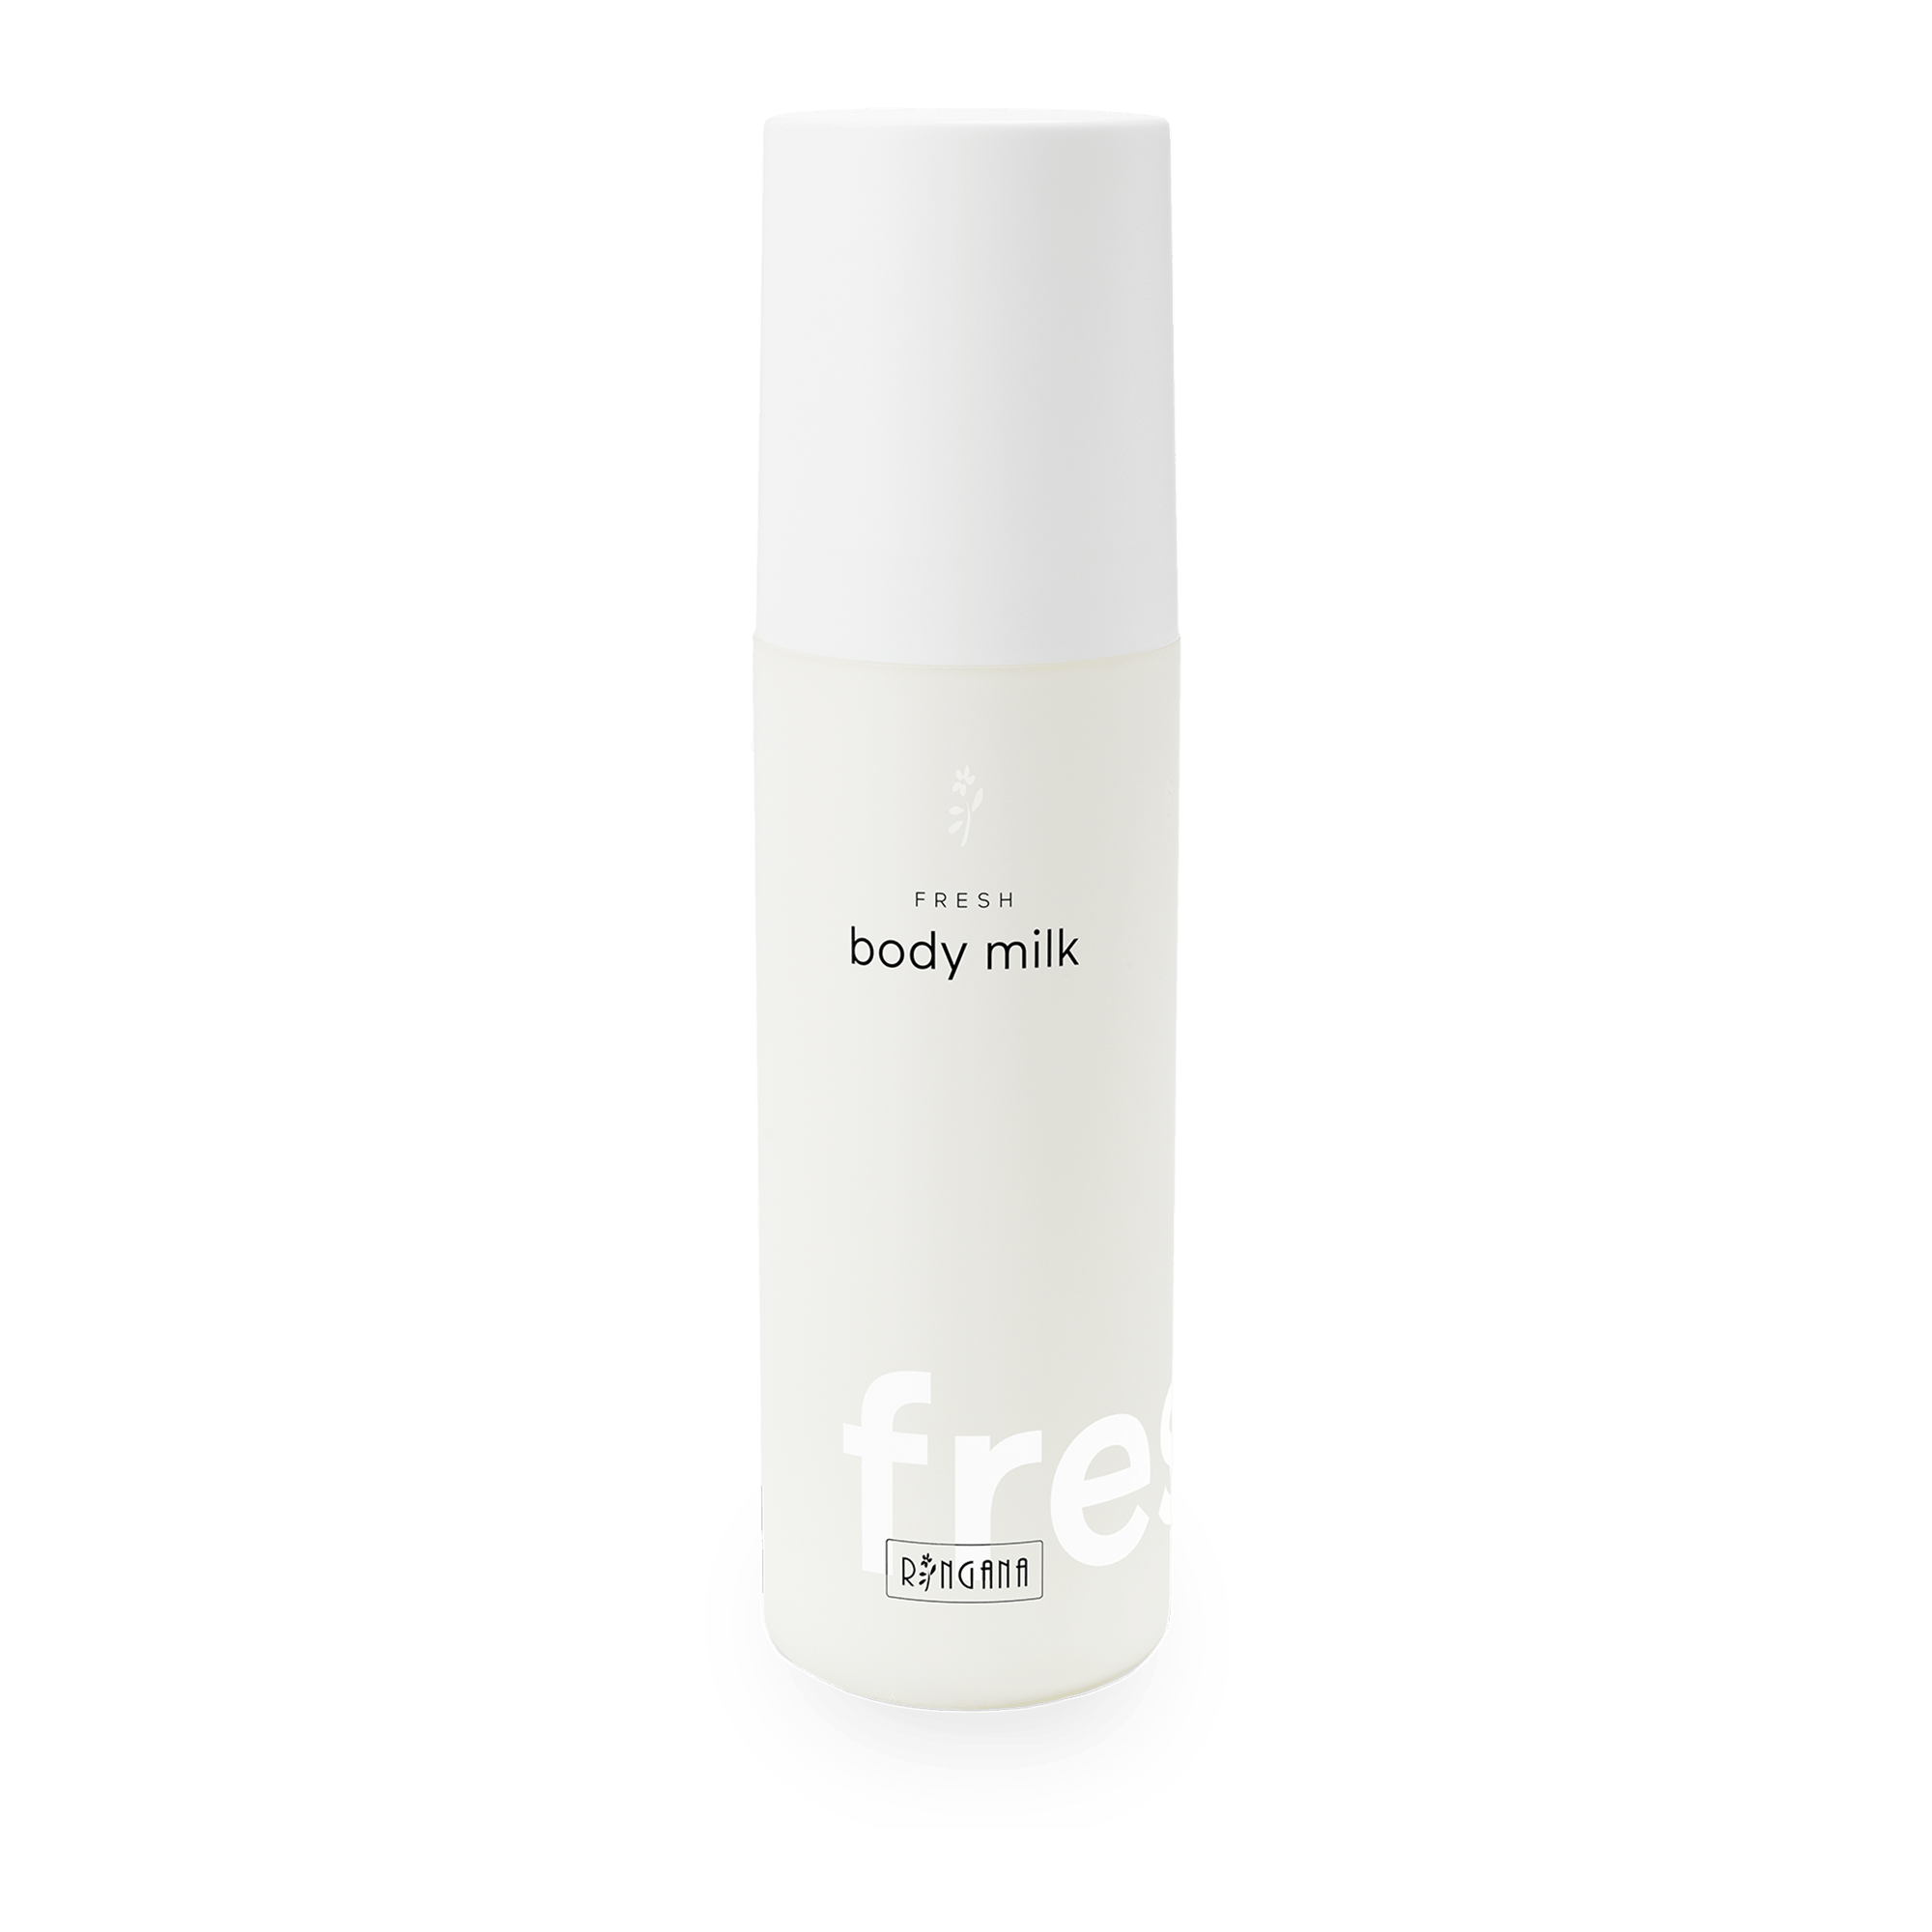 Produktbild FRESH body milk